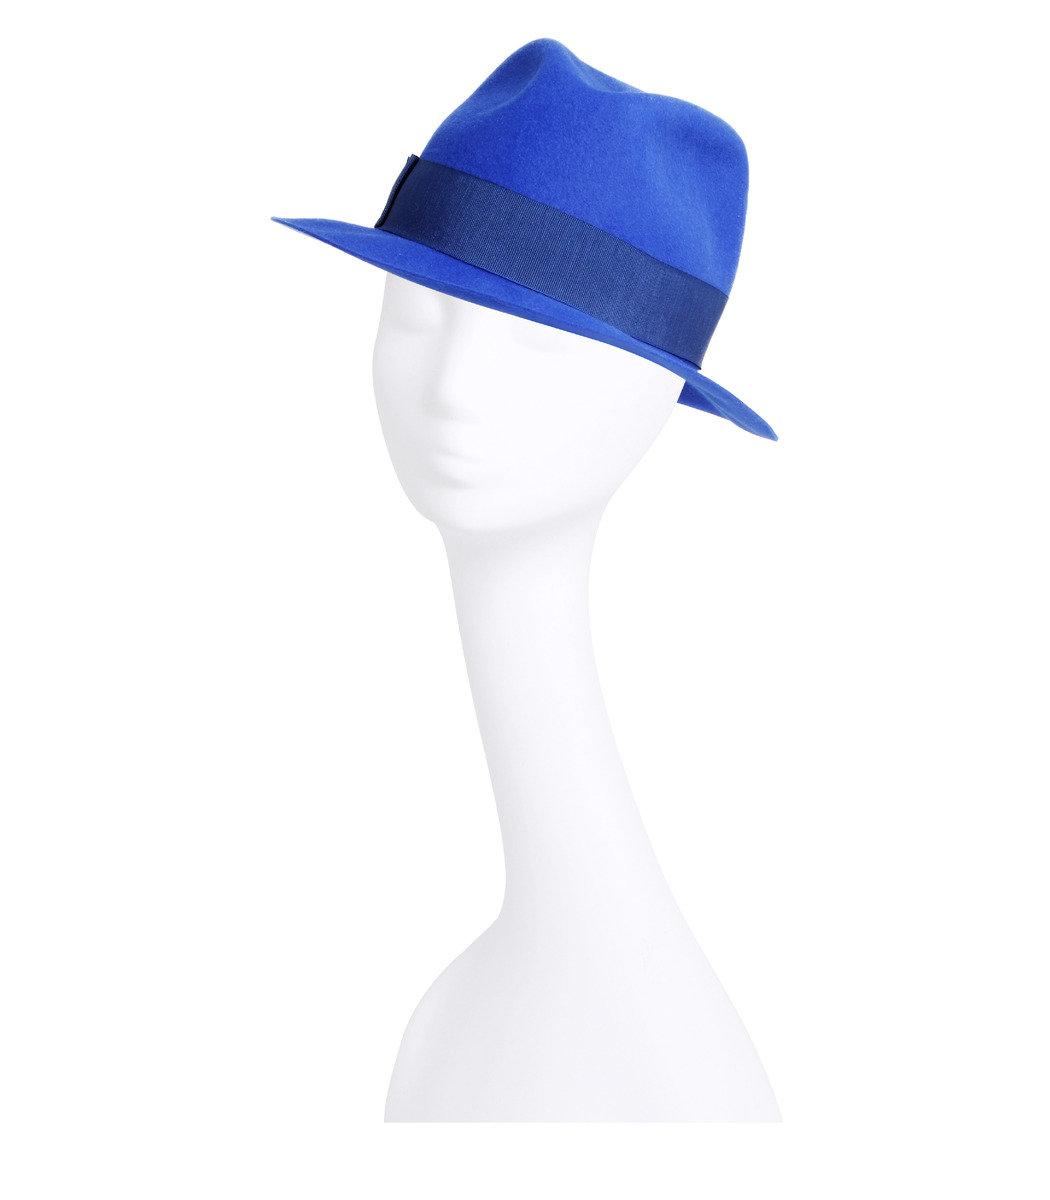 羊毛 fedora 帽子